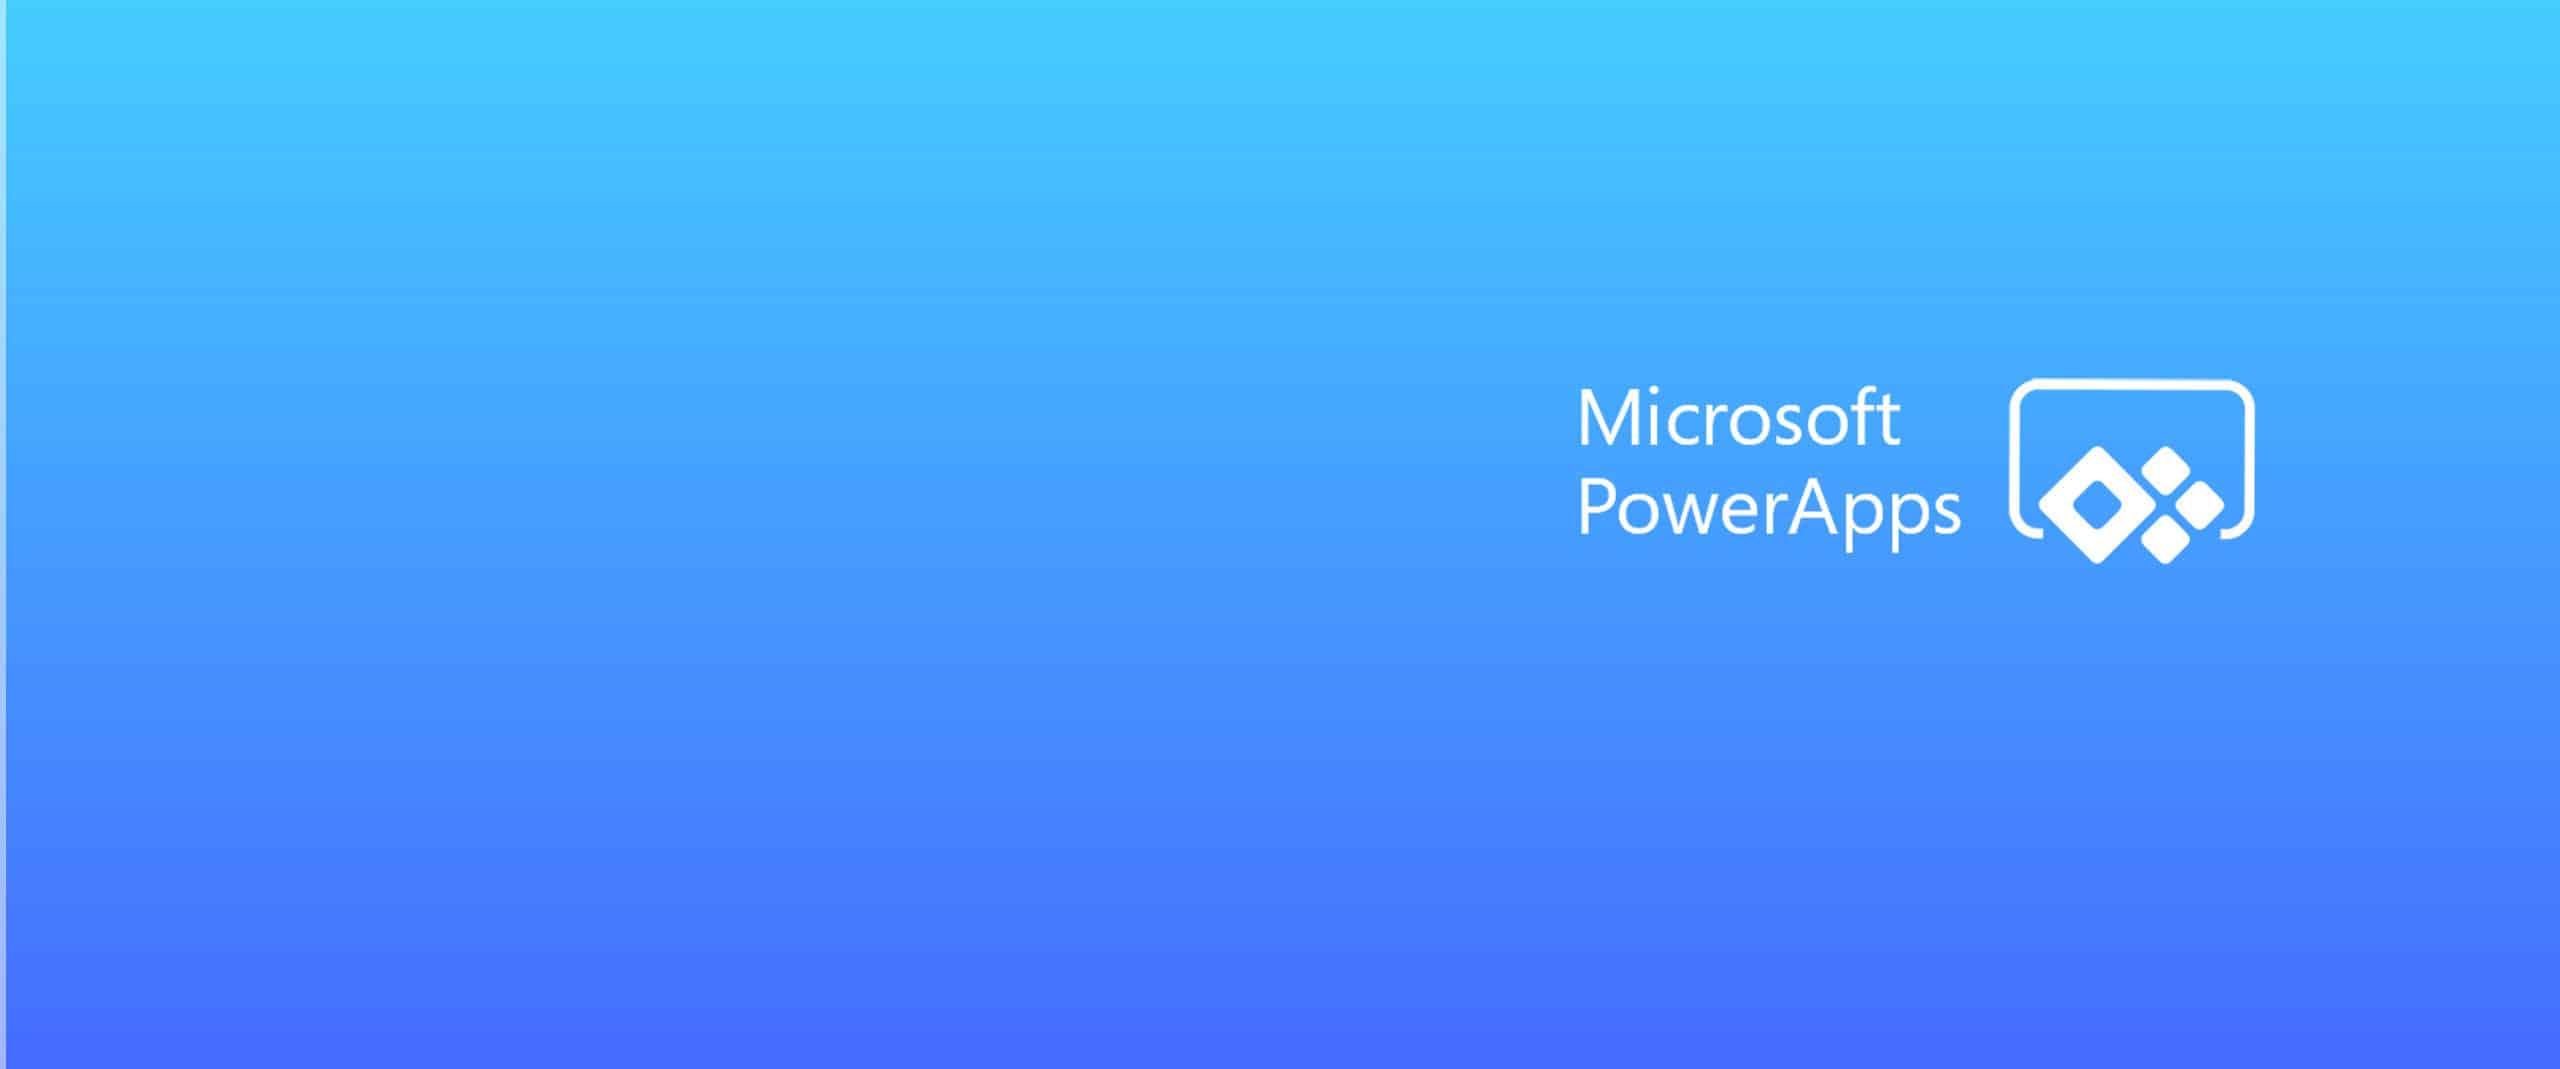 Microsoft PowerApps header